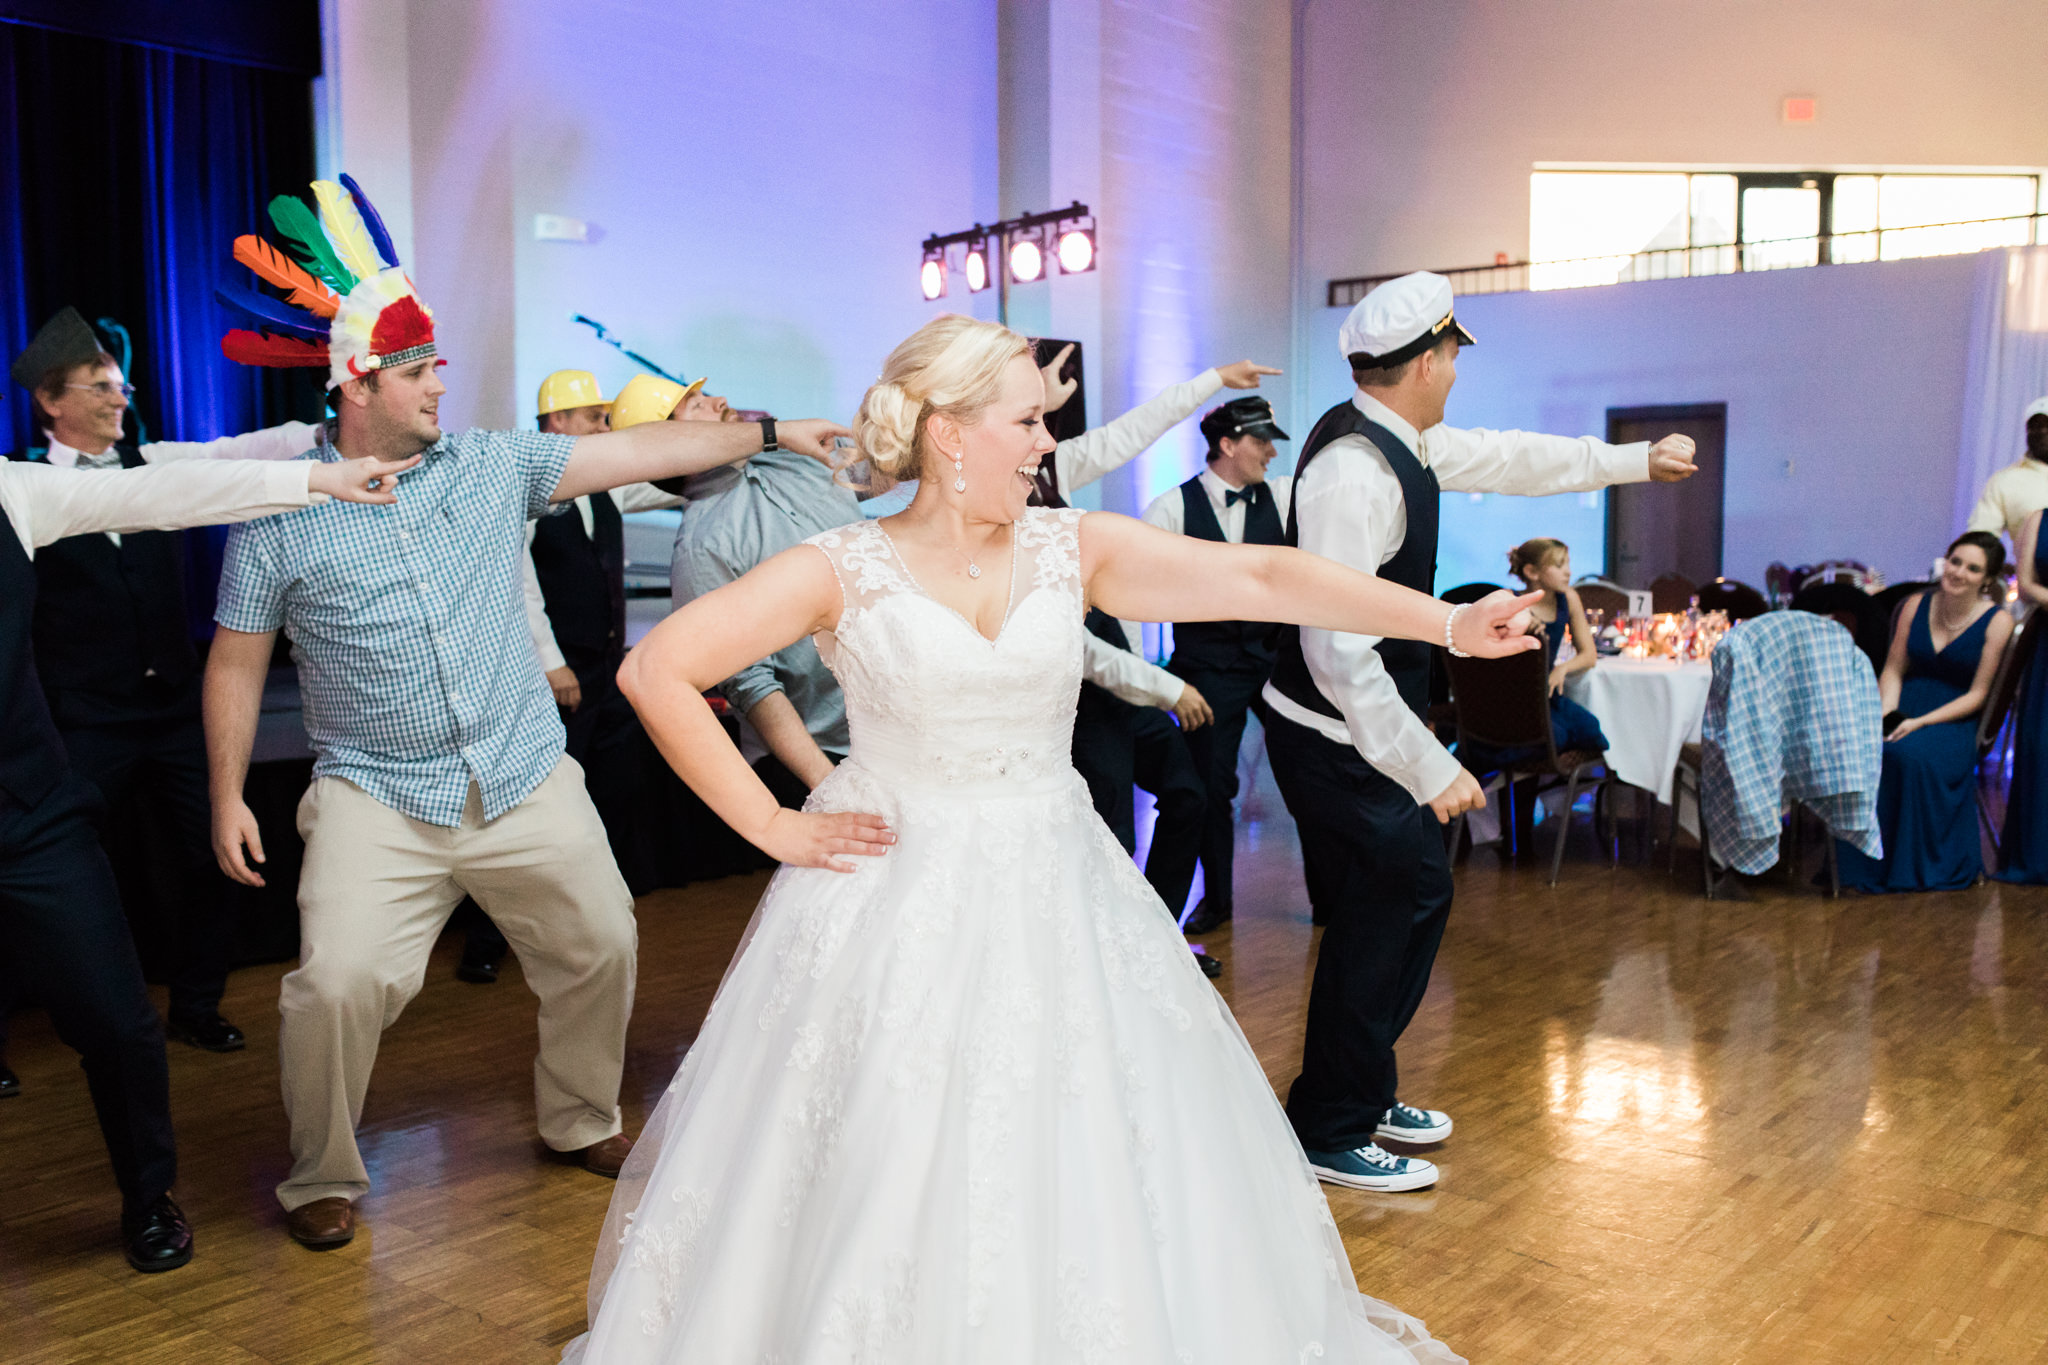 Groomsmen performing as the village people at Bellarmine wedding reception in Louisville ky